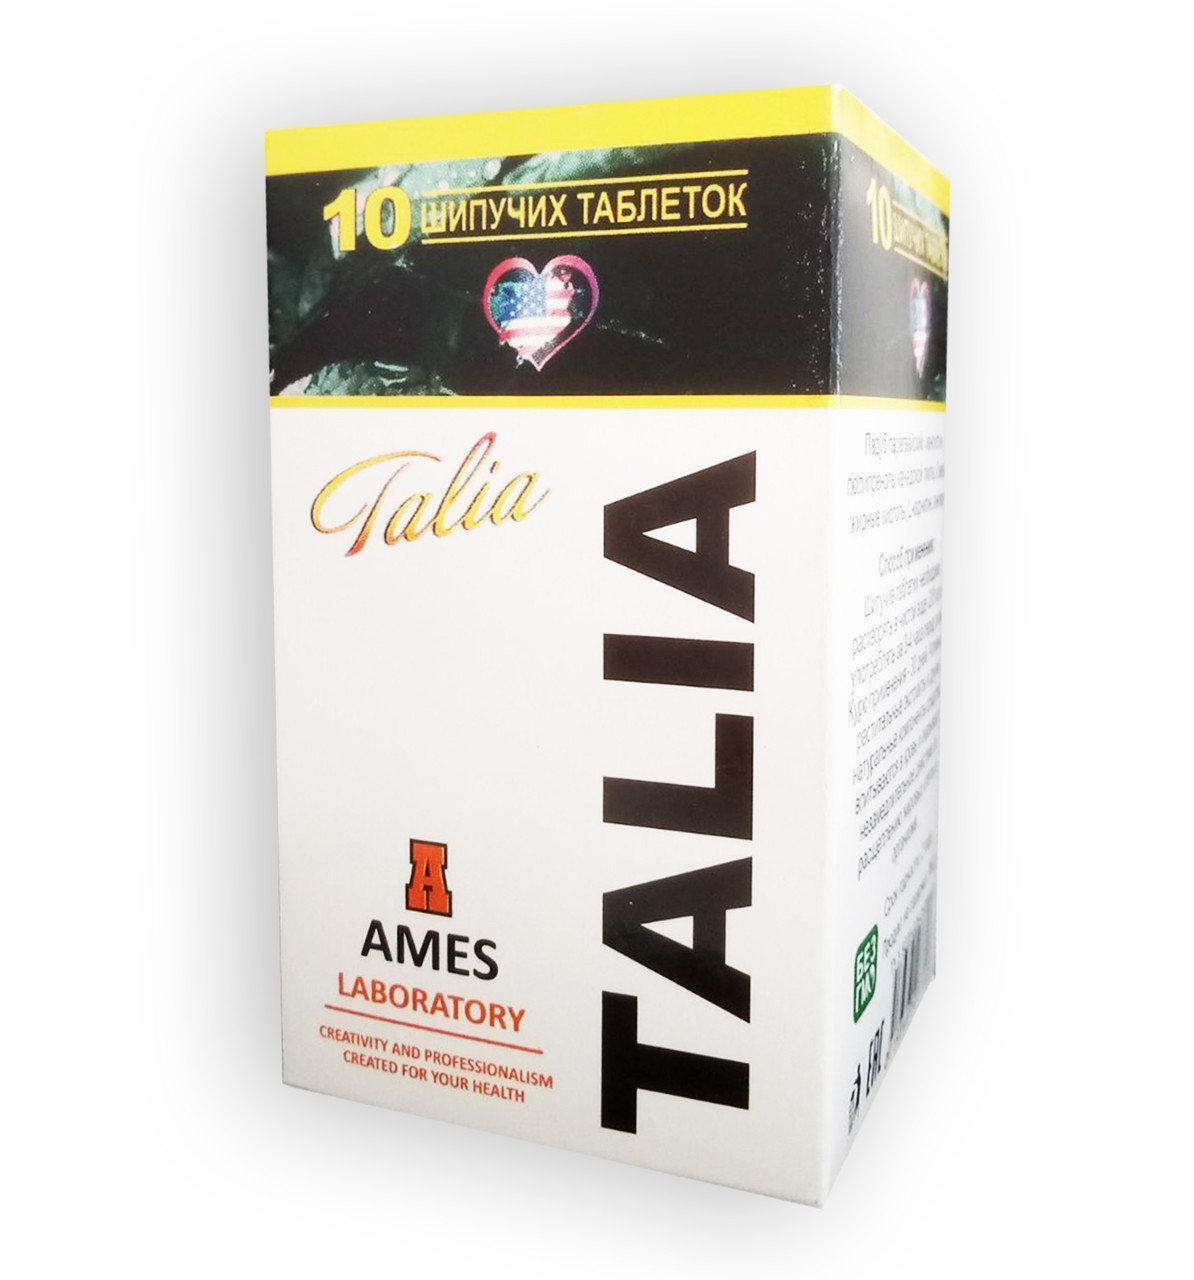 Talia - Шипучі таблетки для схуднення (Талія) ViPpils